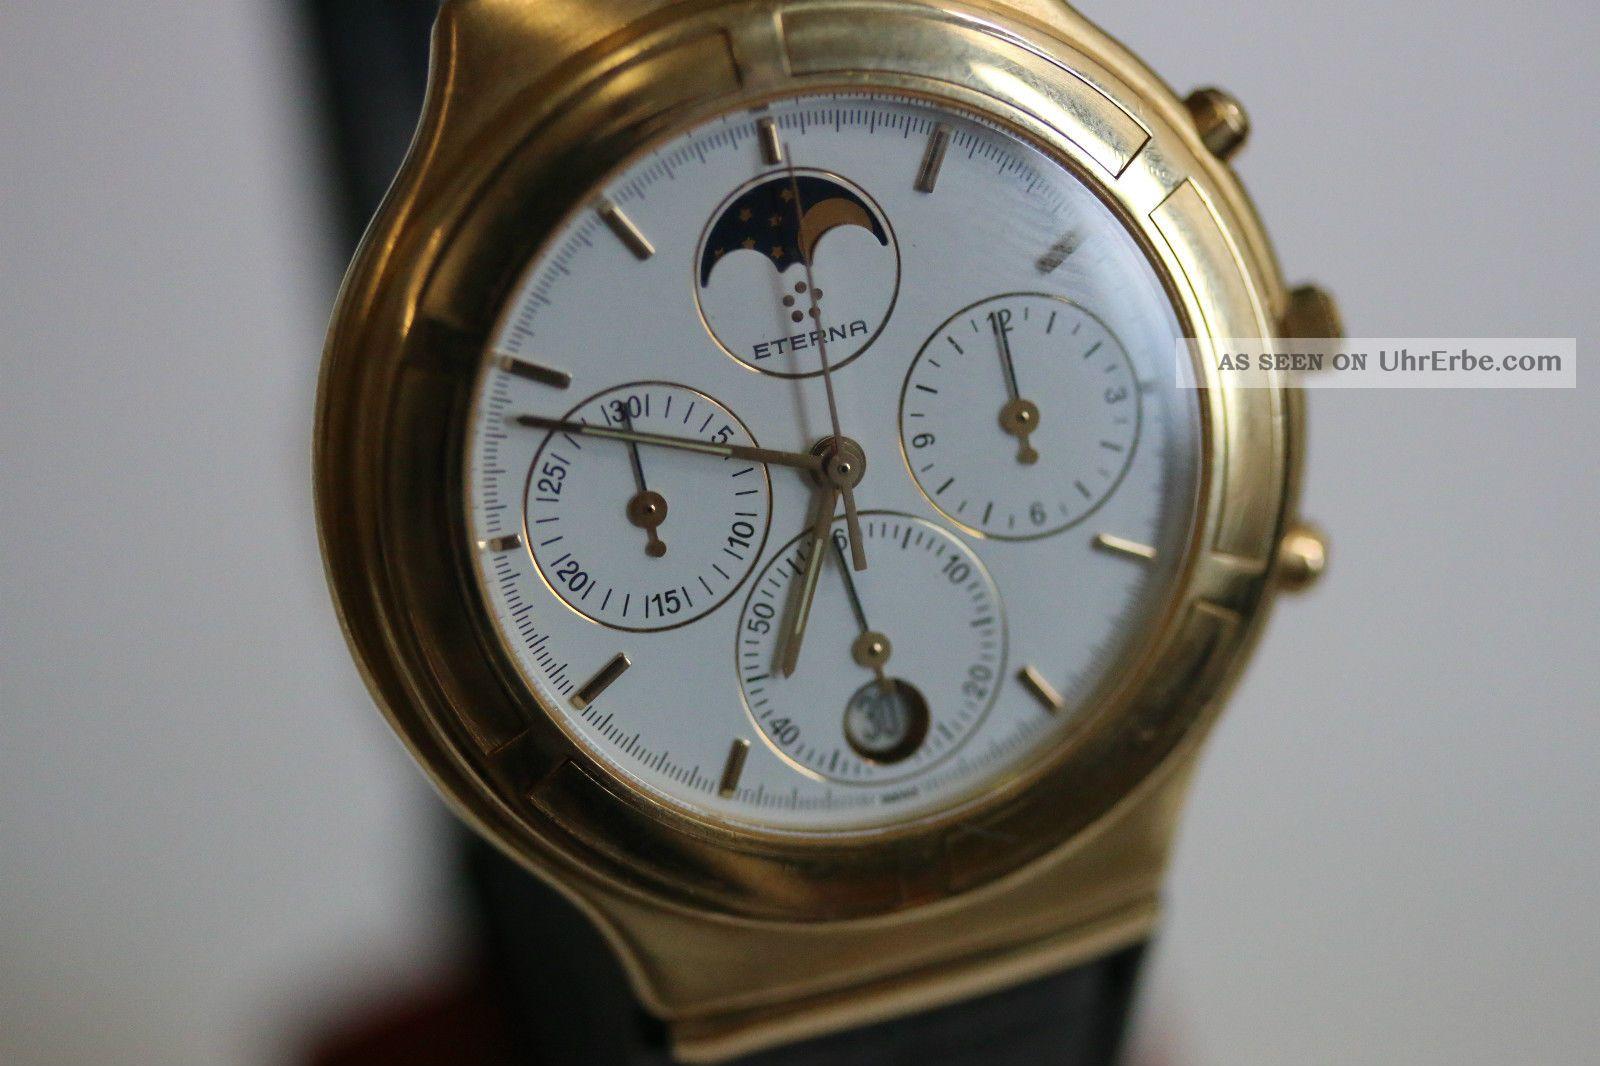 Eterna Airforce,  Herrenmodell,  Gelbgold,  Chronograph,  Mondphase Avs2704 Dif Rwt1 Armbanduhren Bild